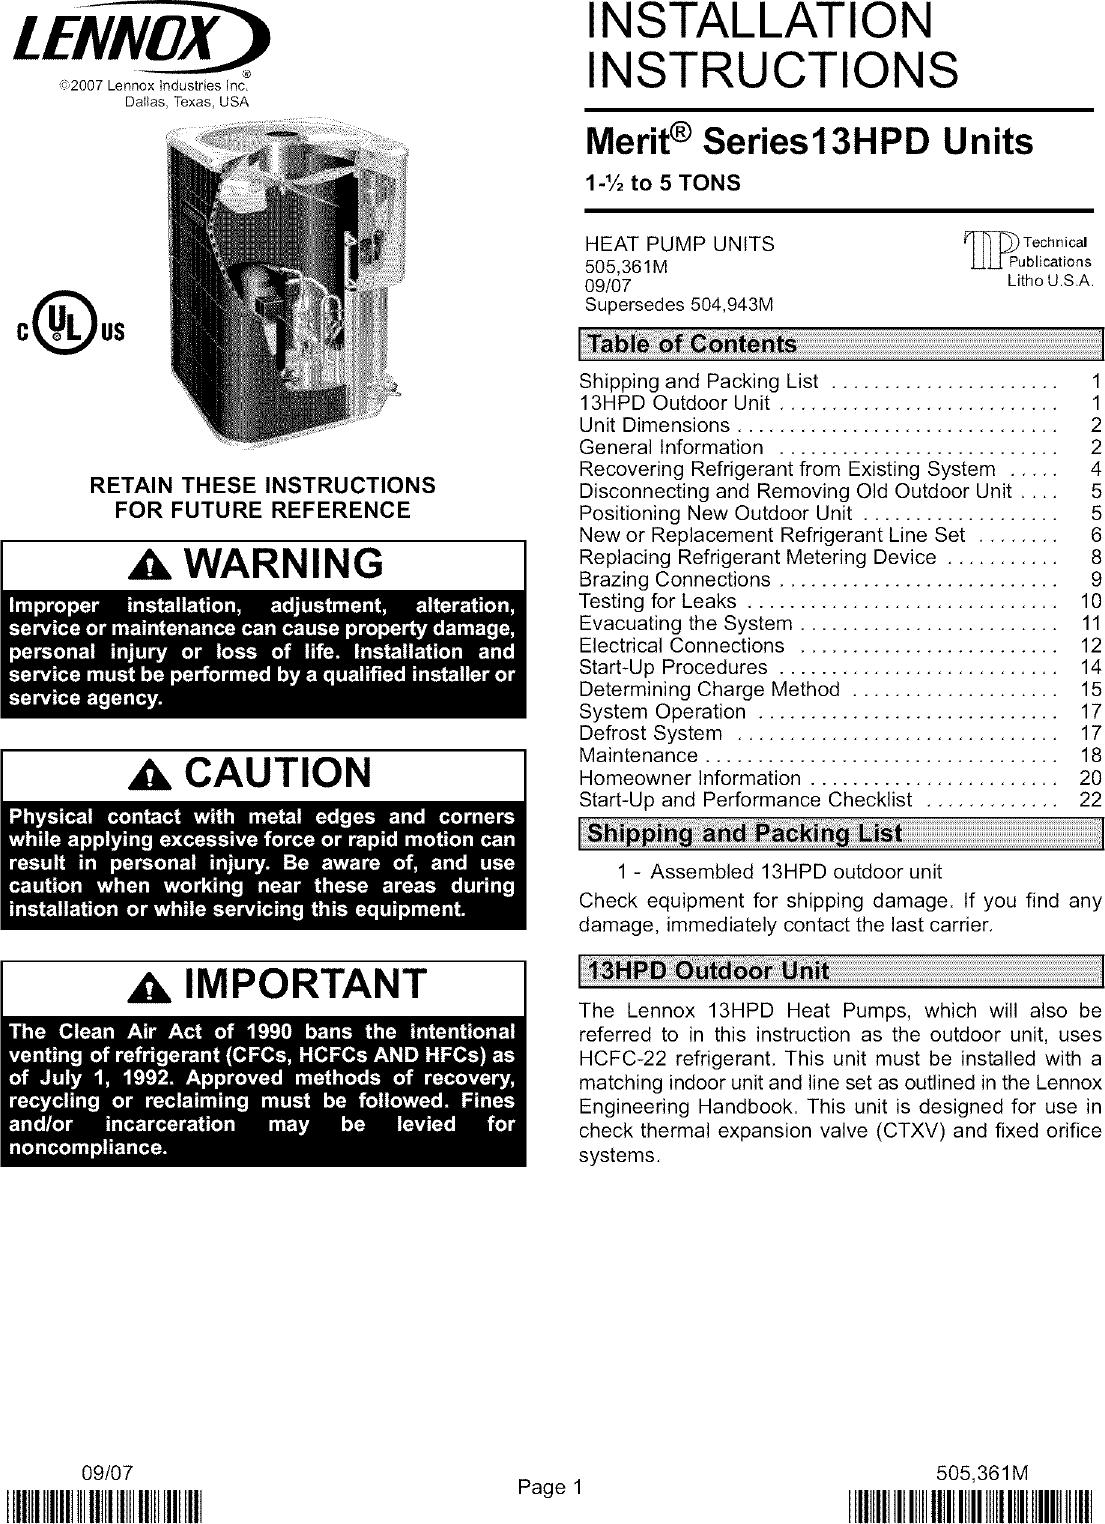 Lennox Air Conditioner Heat Pump Outside Unit Manual L0806419